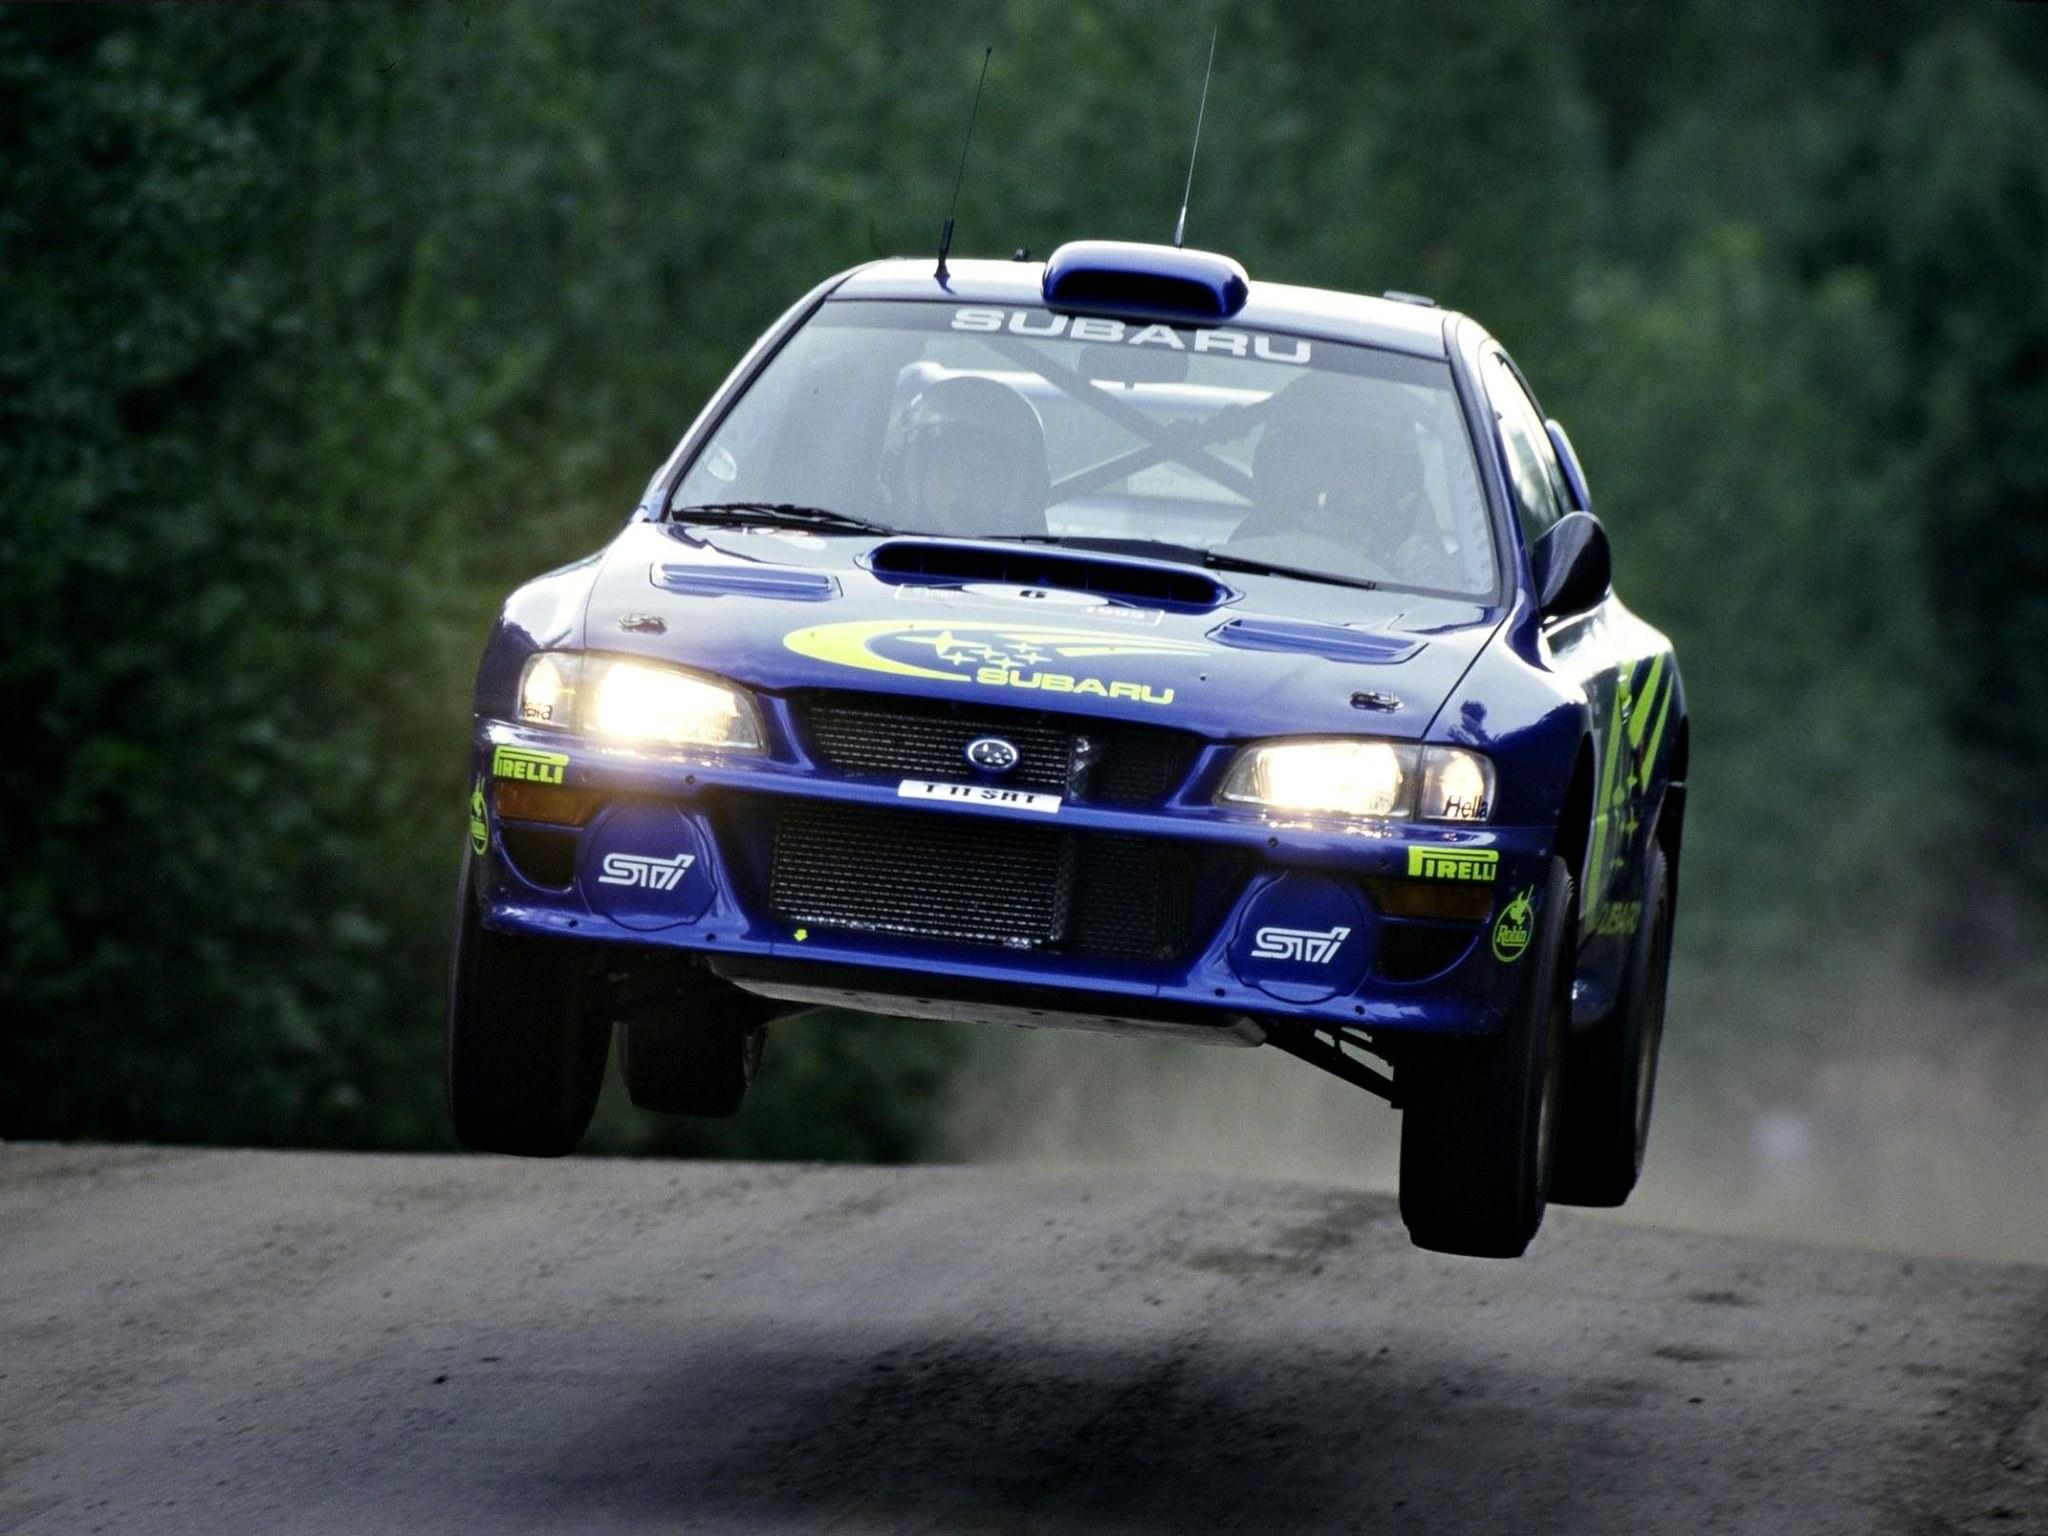 Subaru Impreza WRC picture # 91093 | Subaru photo gallery ...